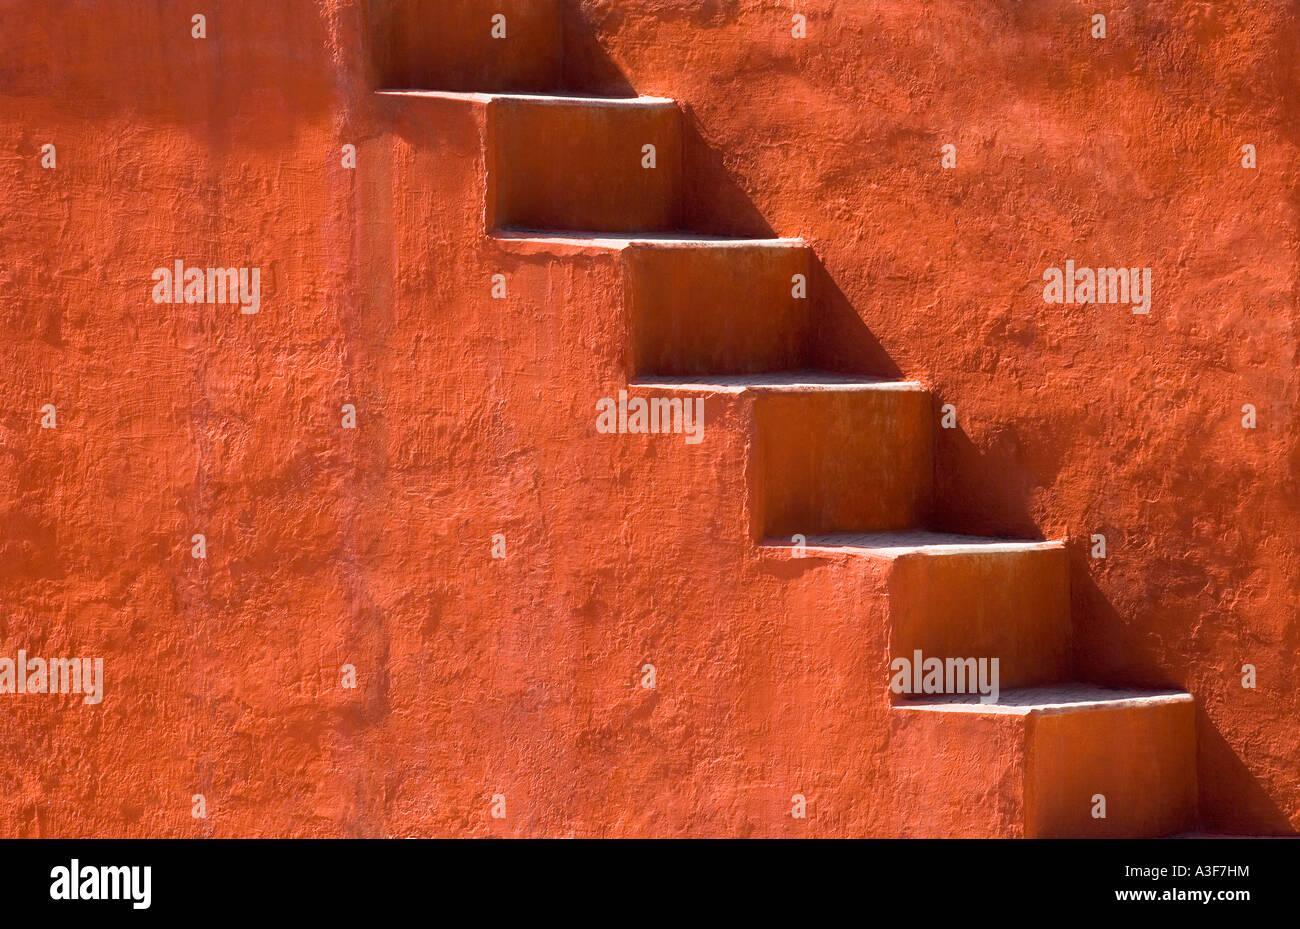 Étapes sur un bâtiment, Jantar Mantar, New Delhi, Inde Photo Stock